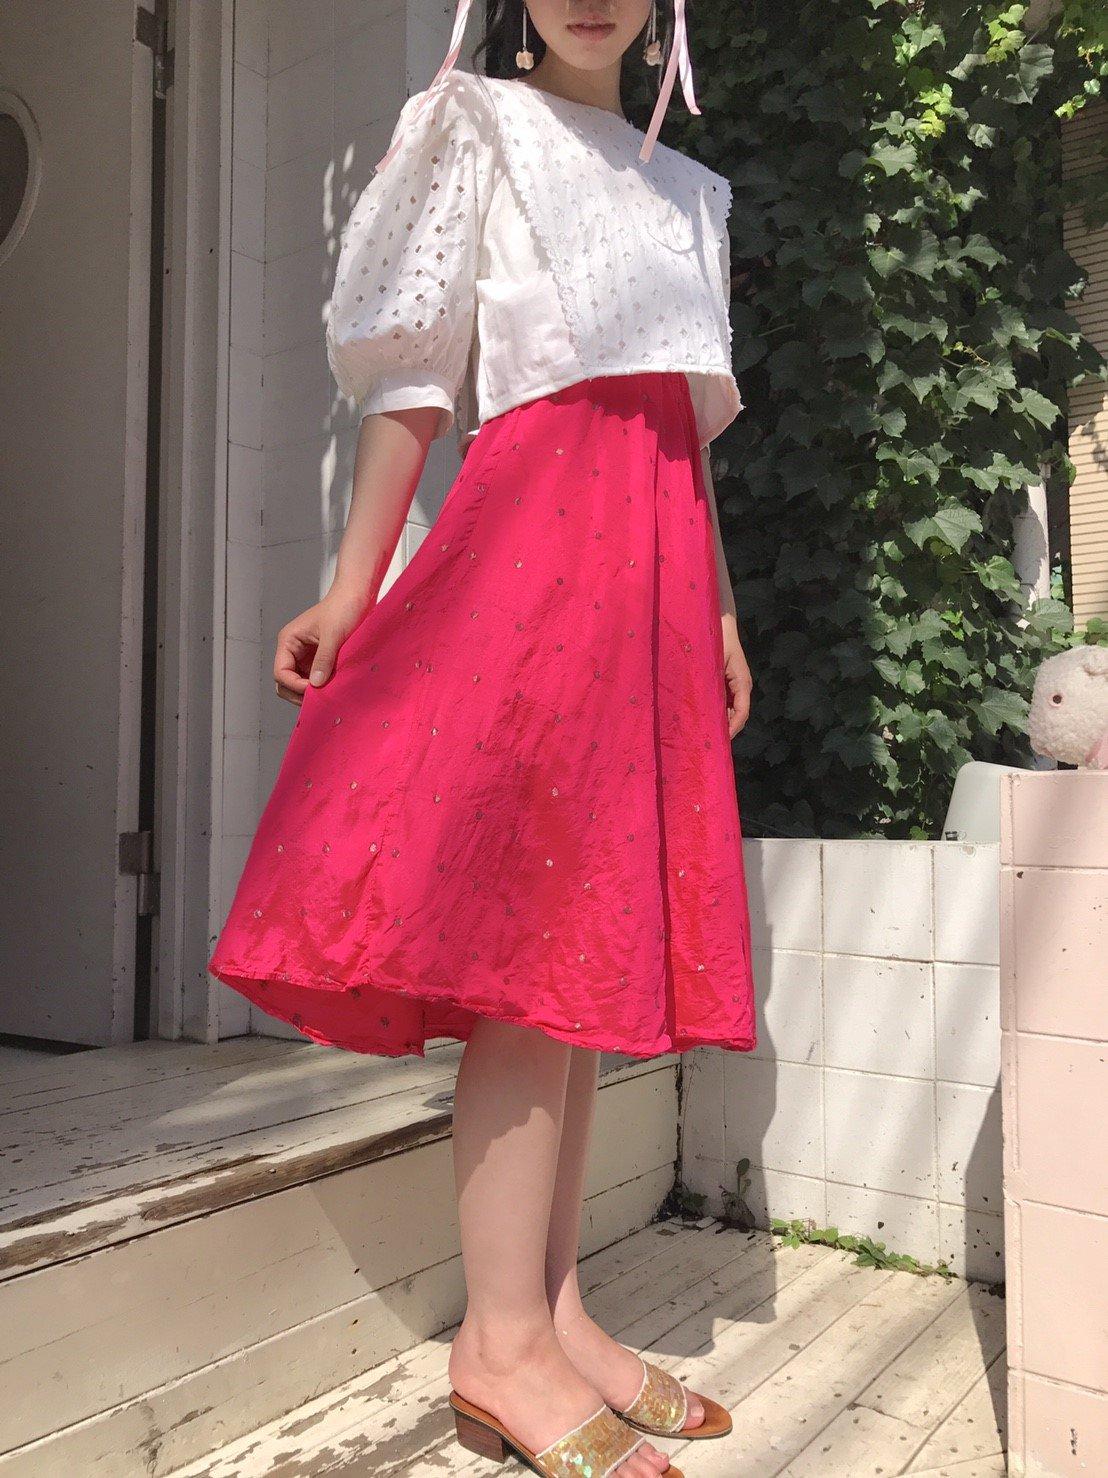 水玉刺繍 vivid pink skirt